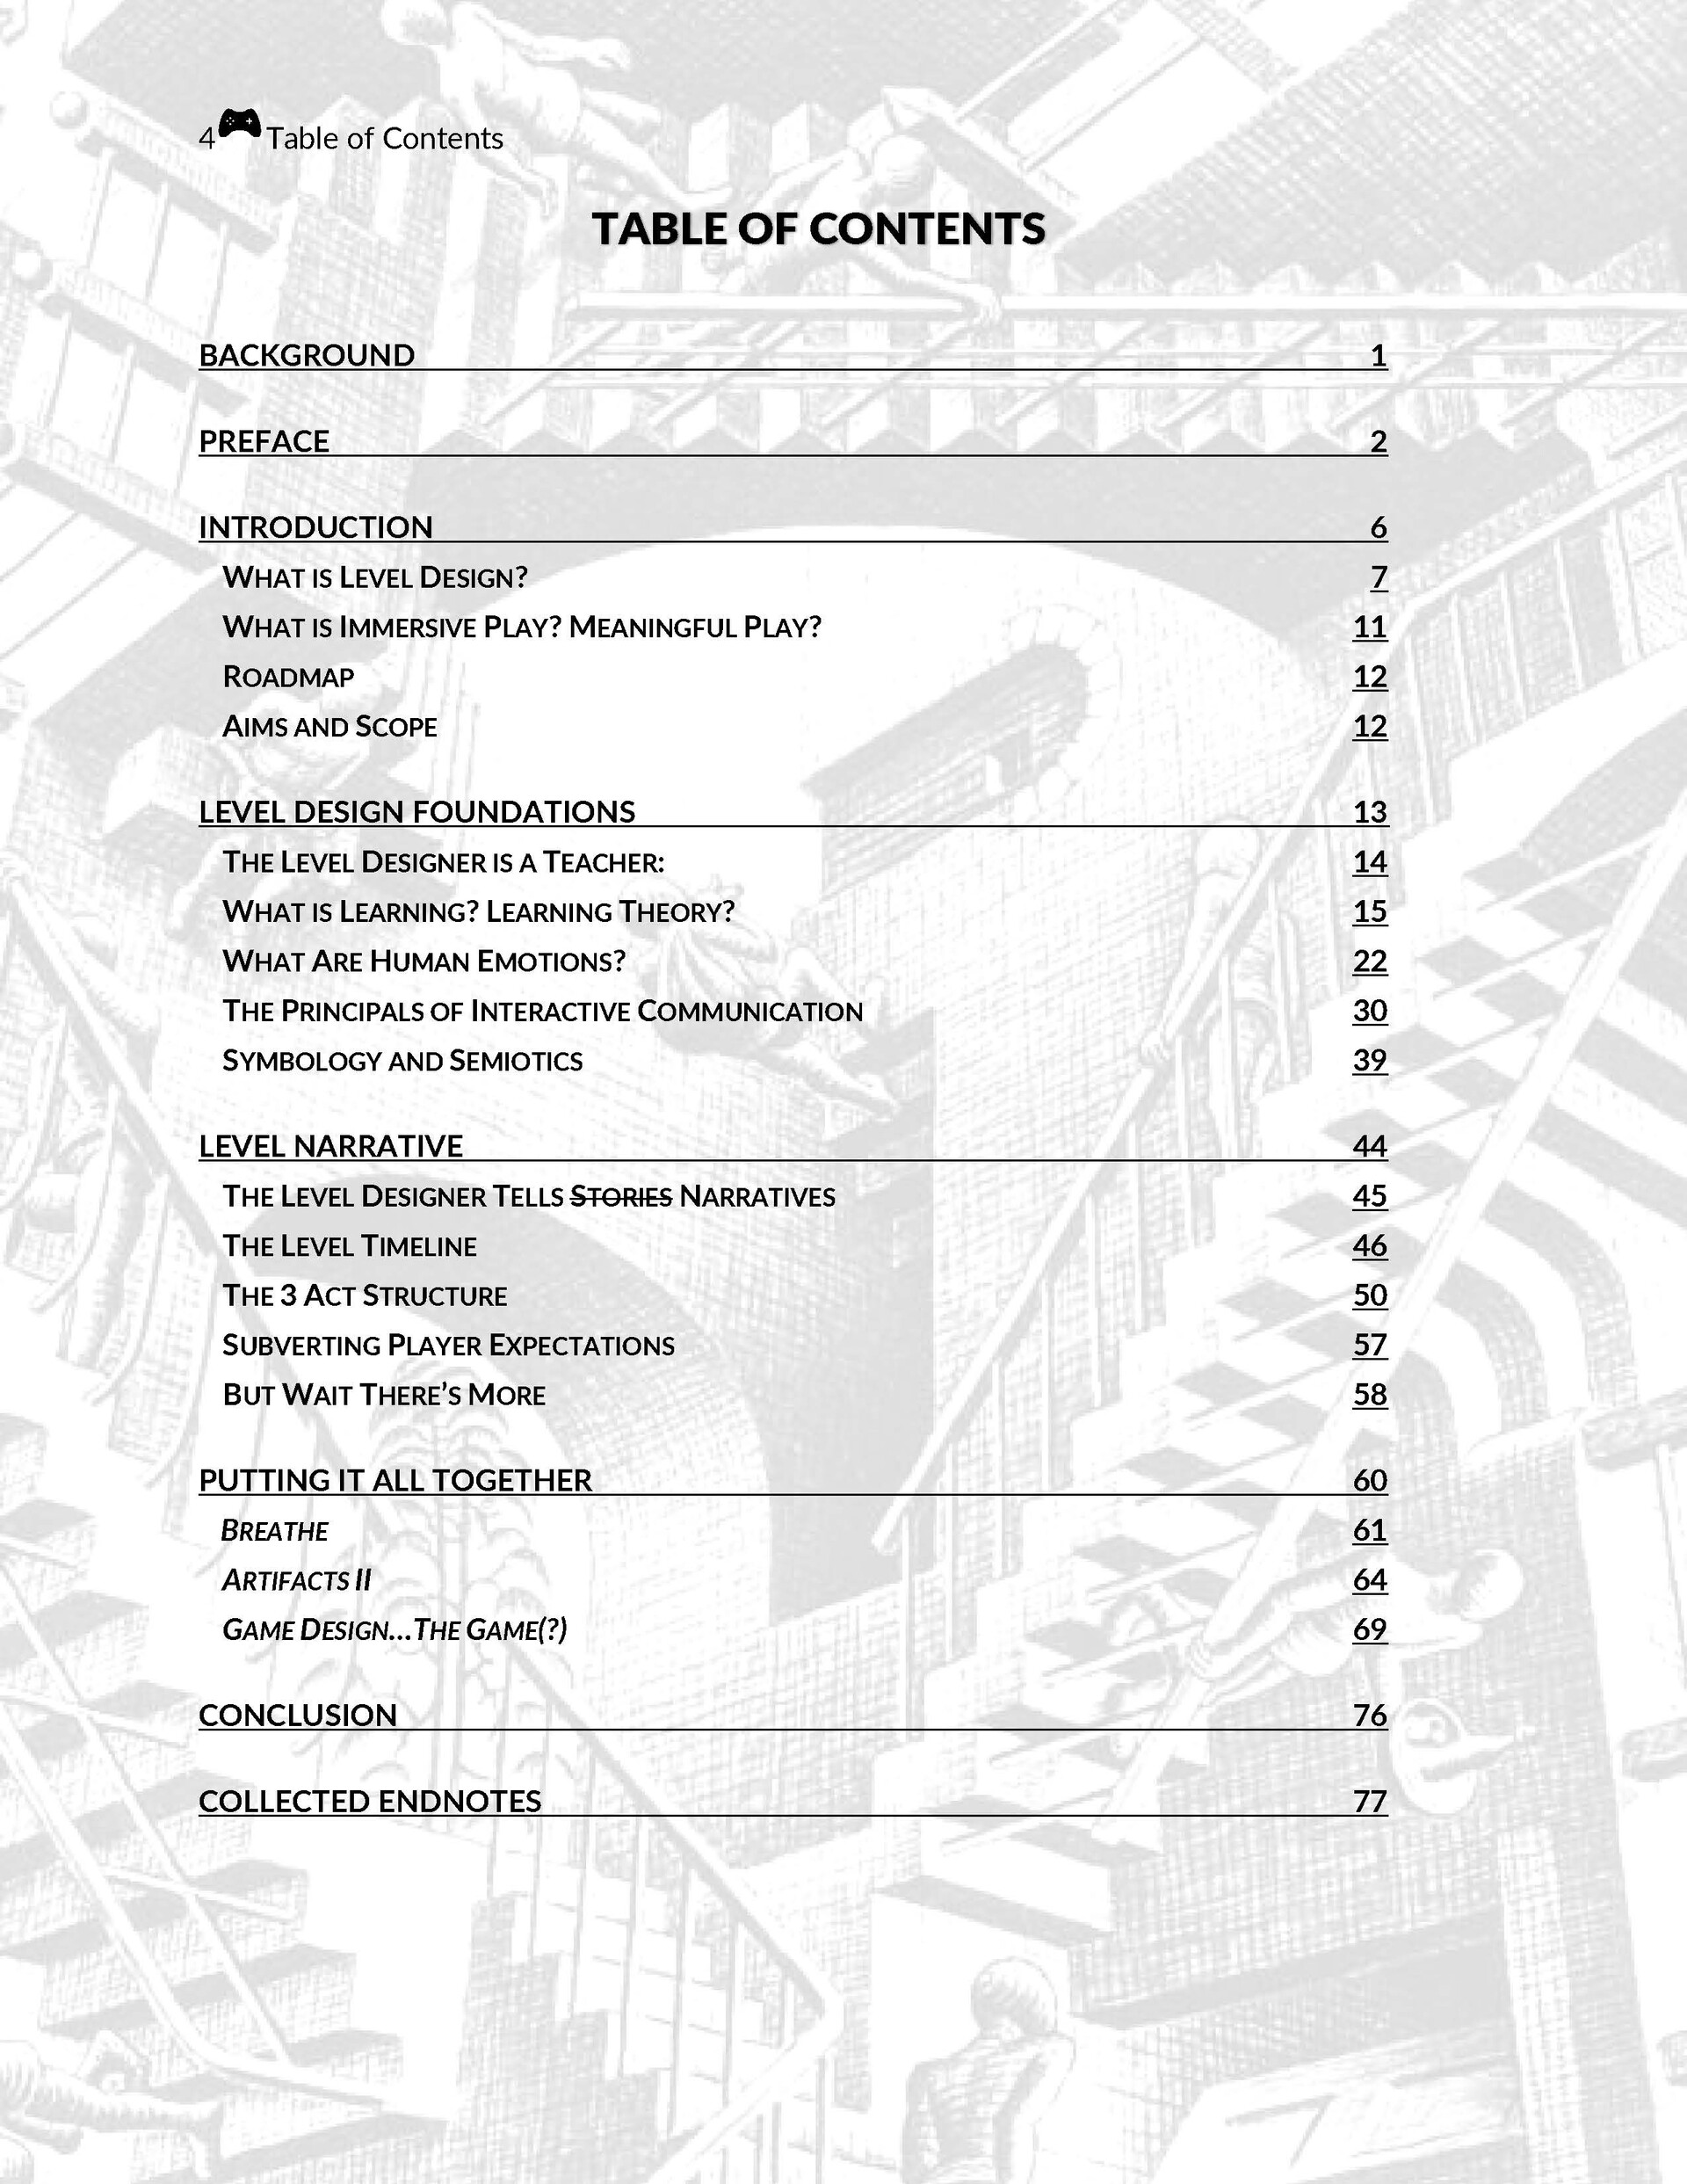 Christina phazero curlee thesisjpg page 12